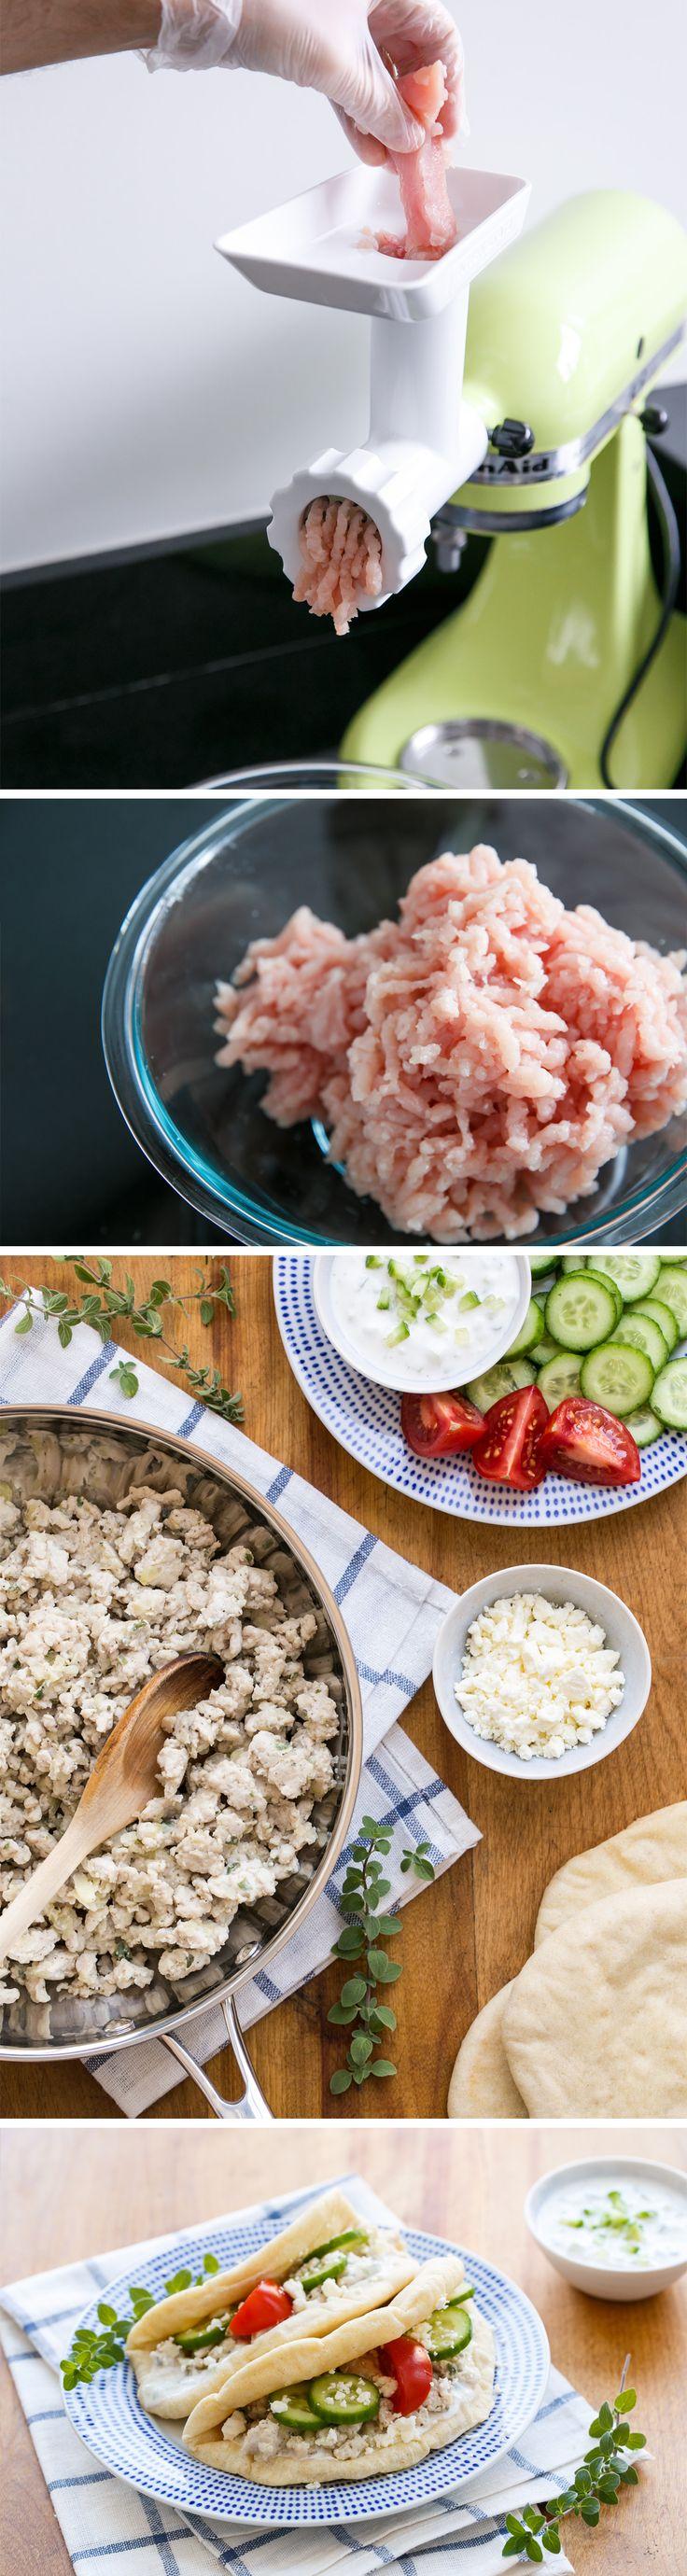 20 Best Ideas About Kitchenaid Meat Grinder On Pinterest